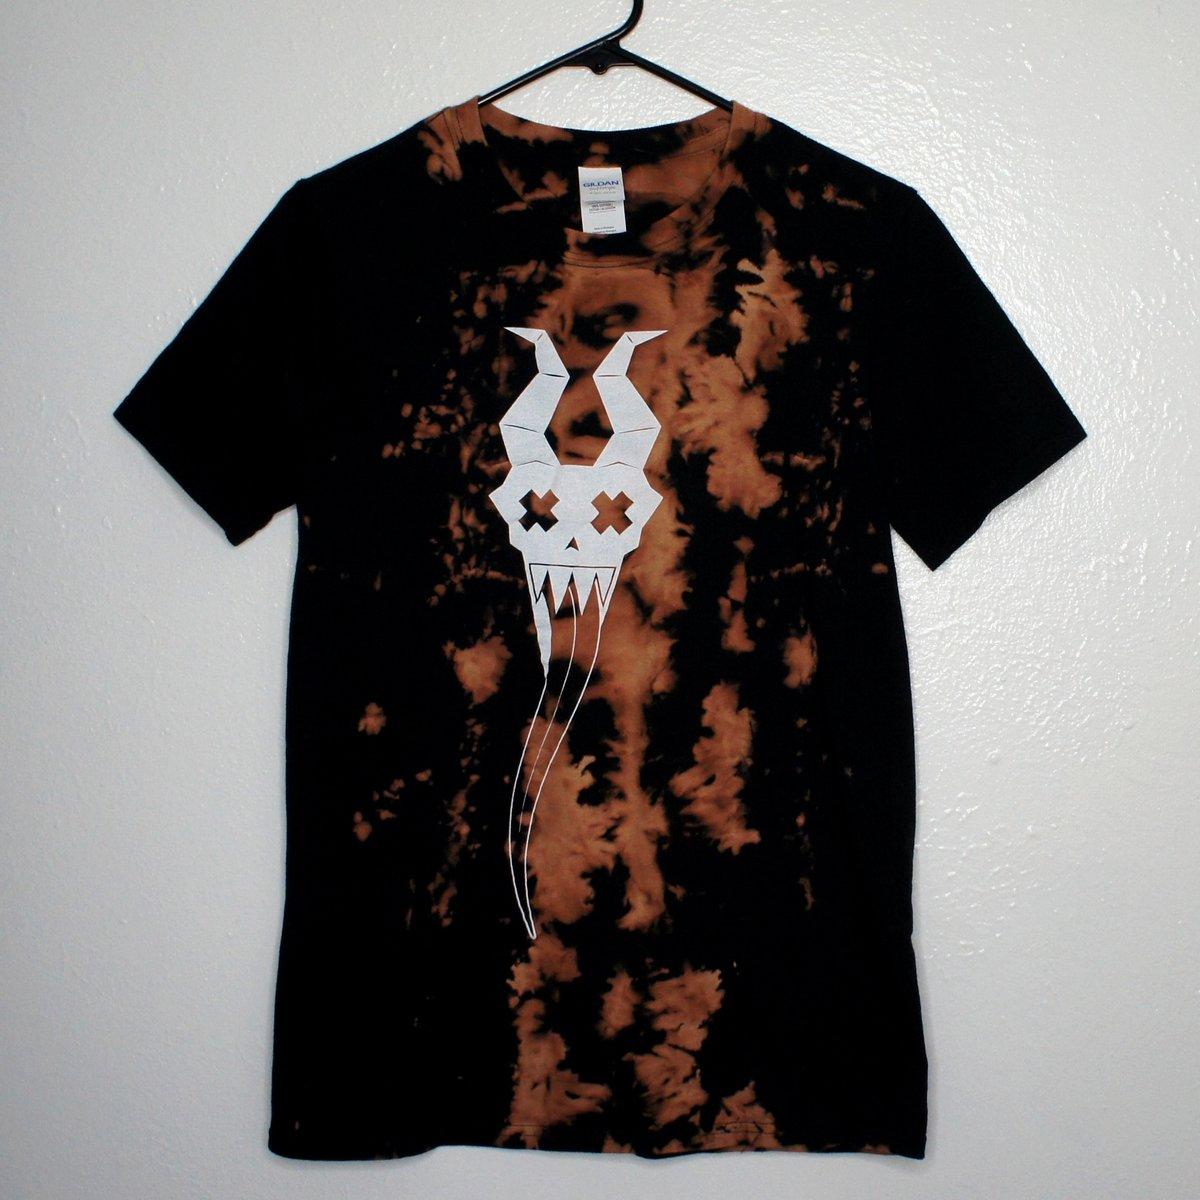 Grunge Krampus T-shirt